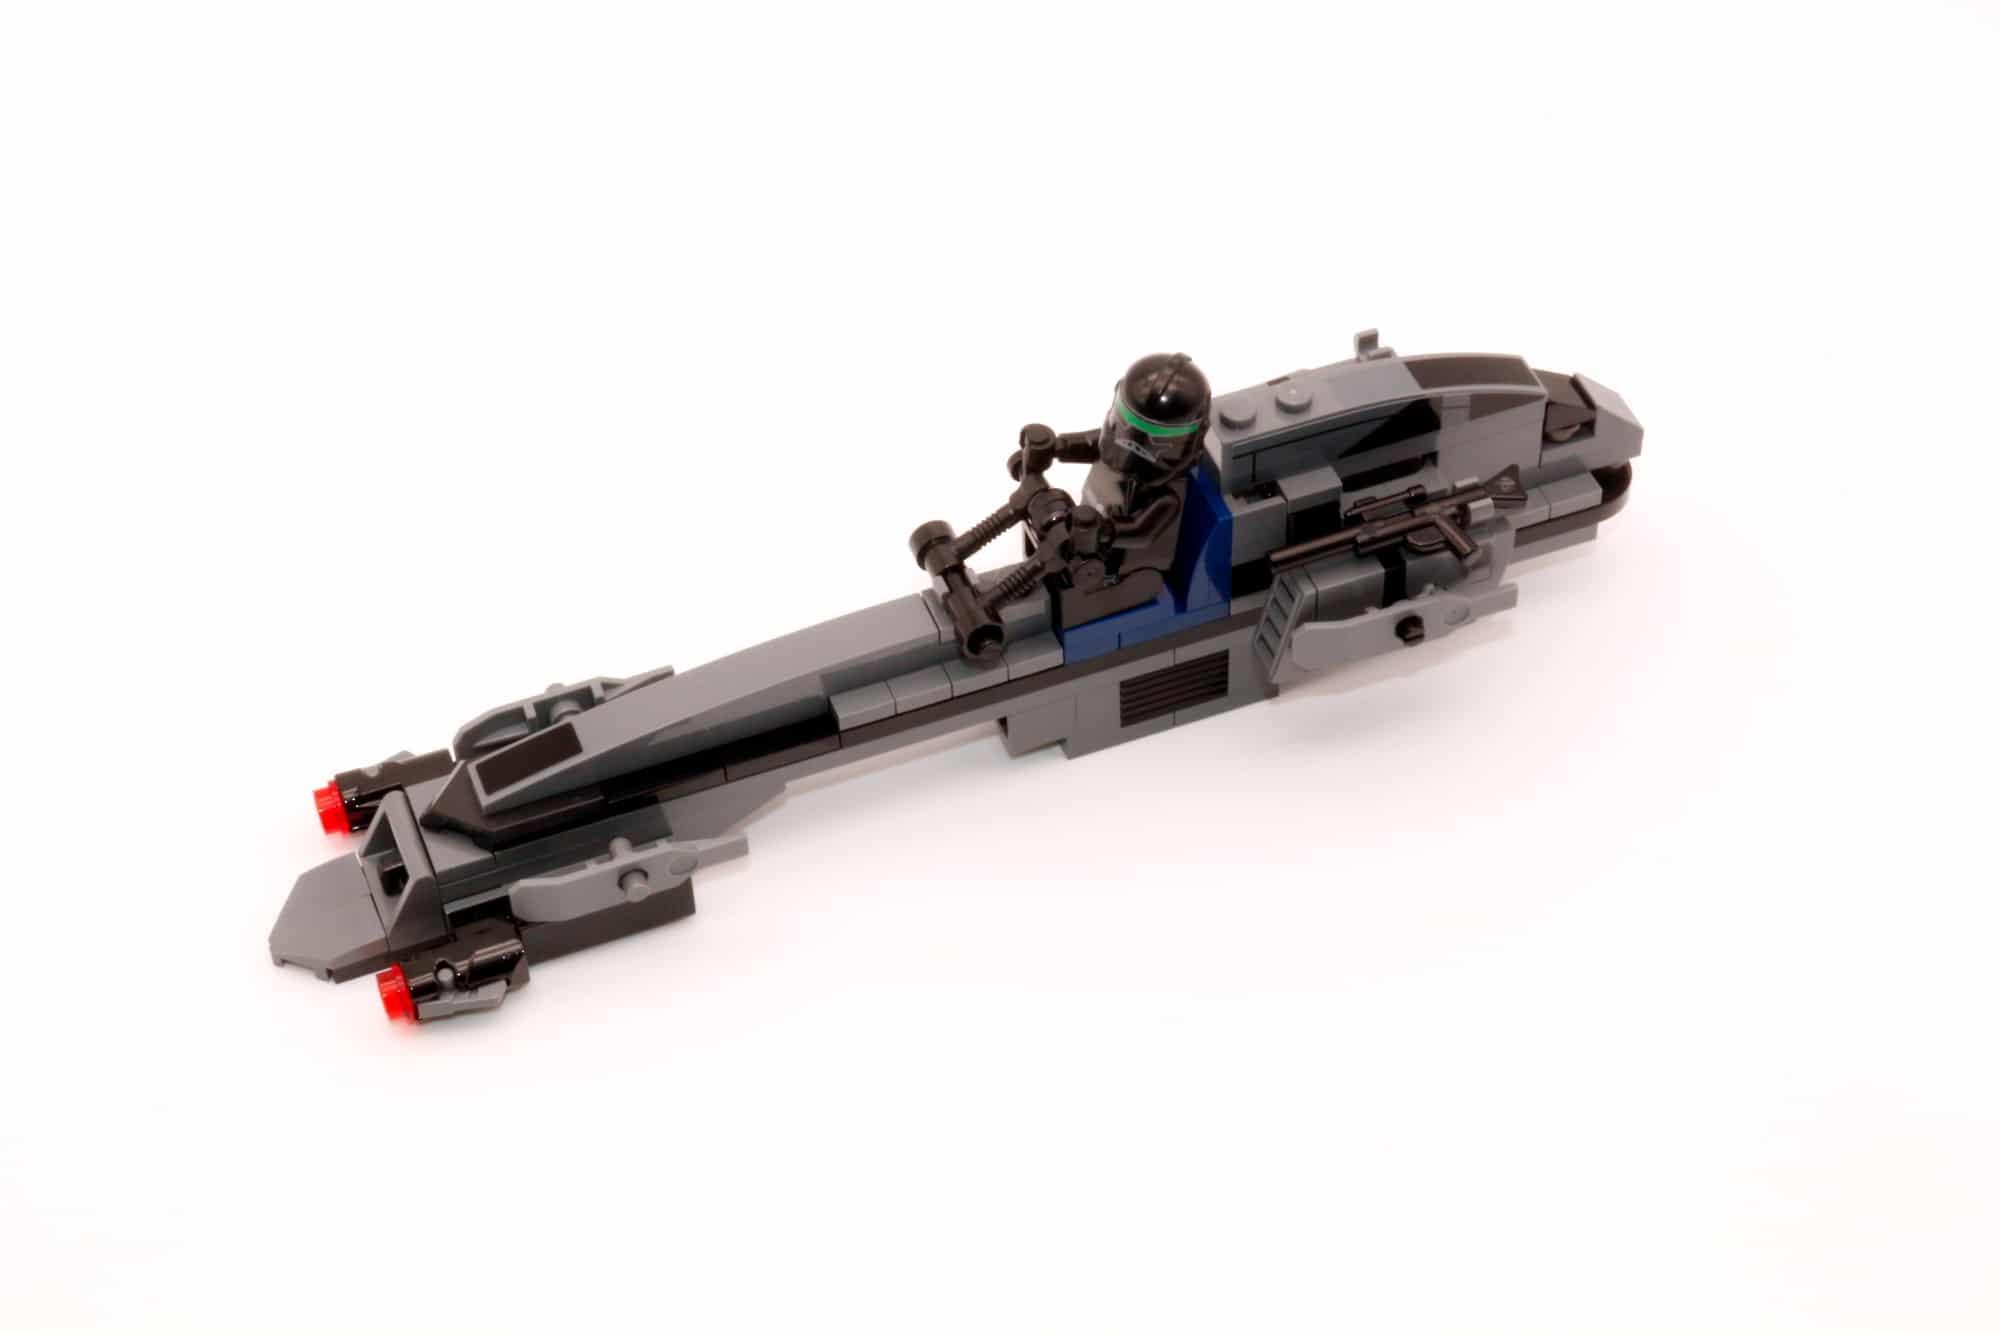 LEGO Star Wars 75314 The Bad Batch Attack Shuttle 12